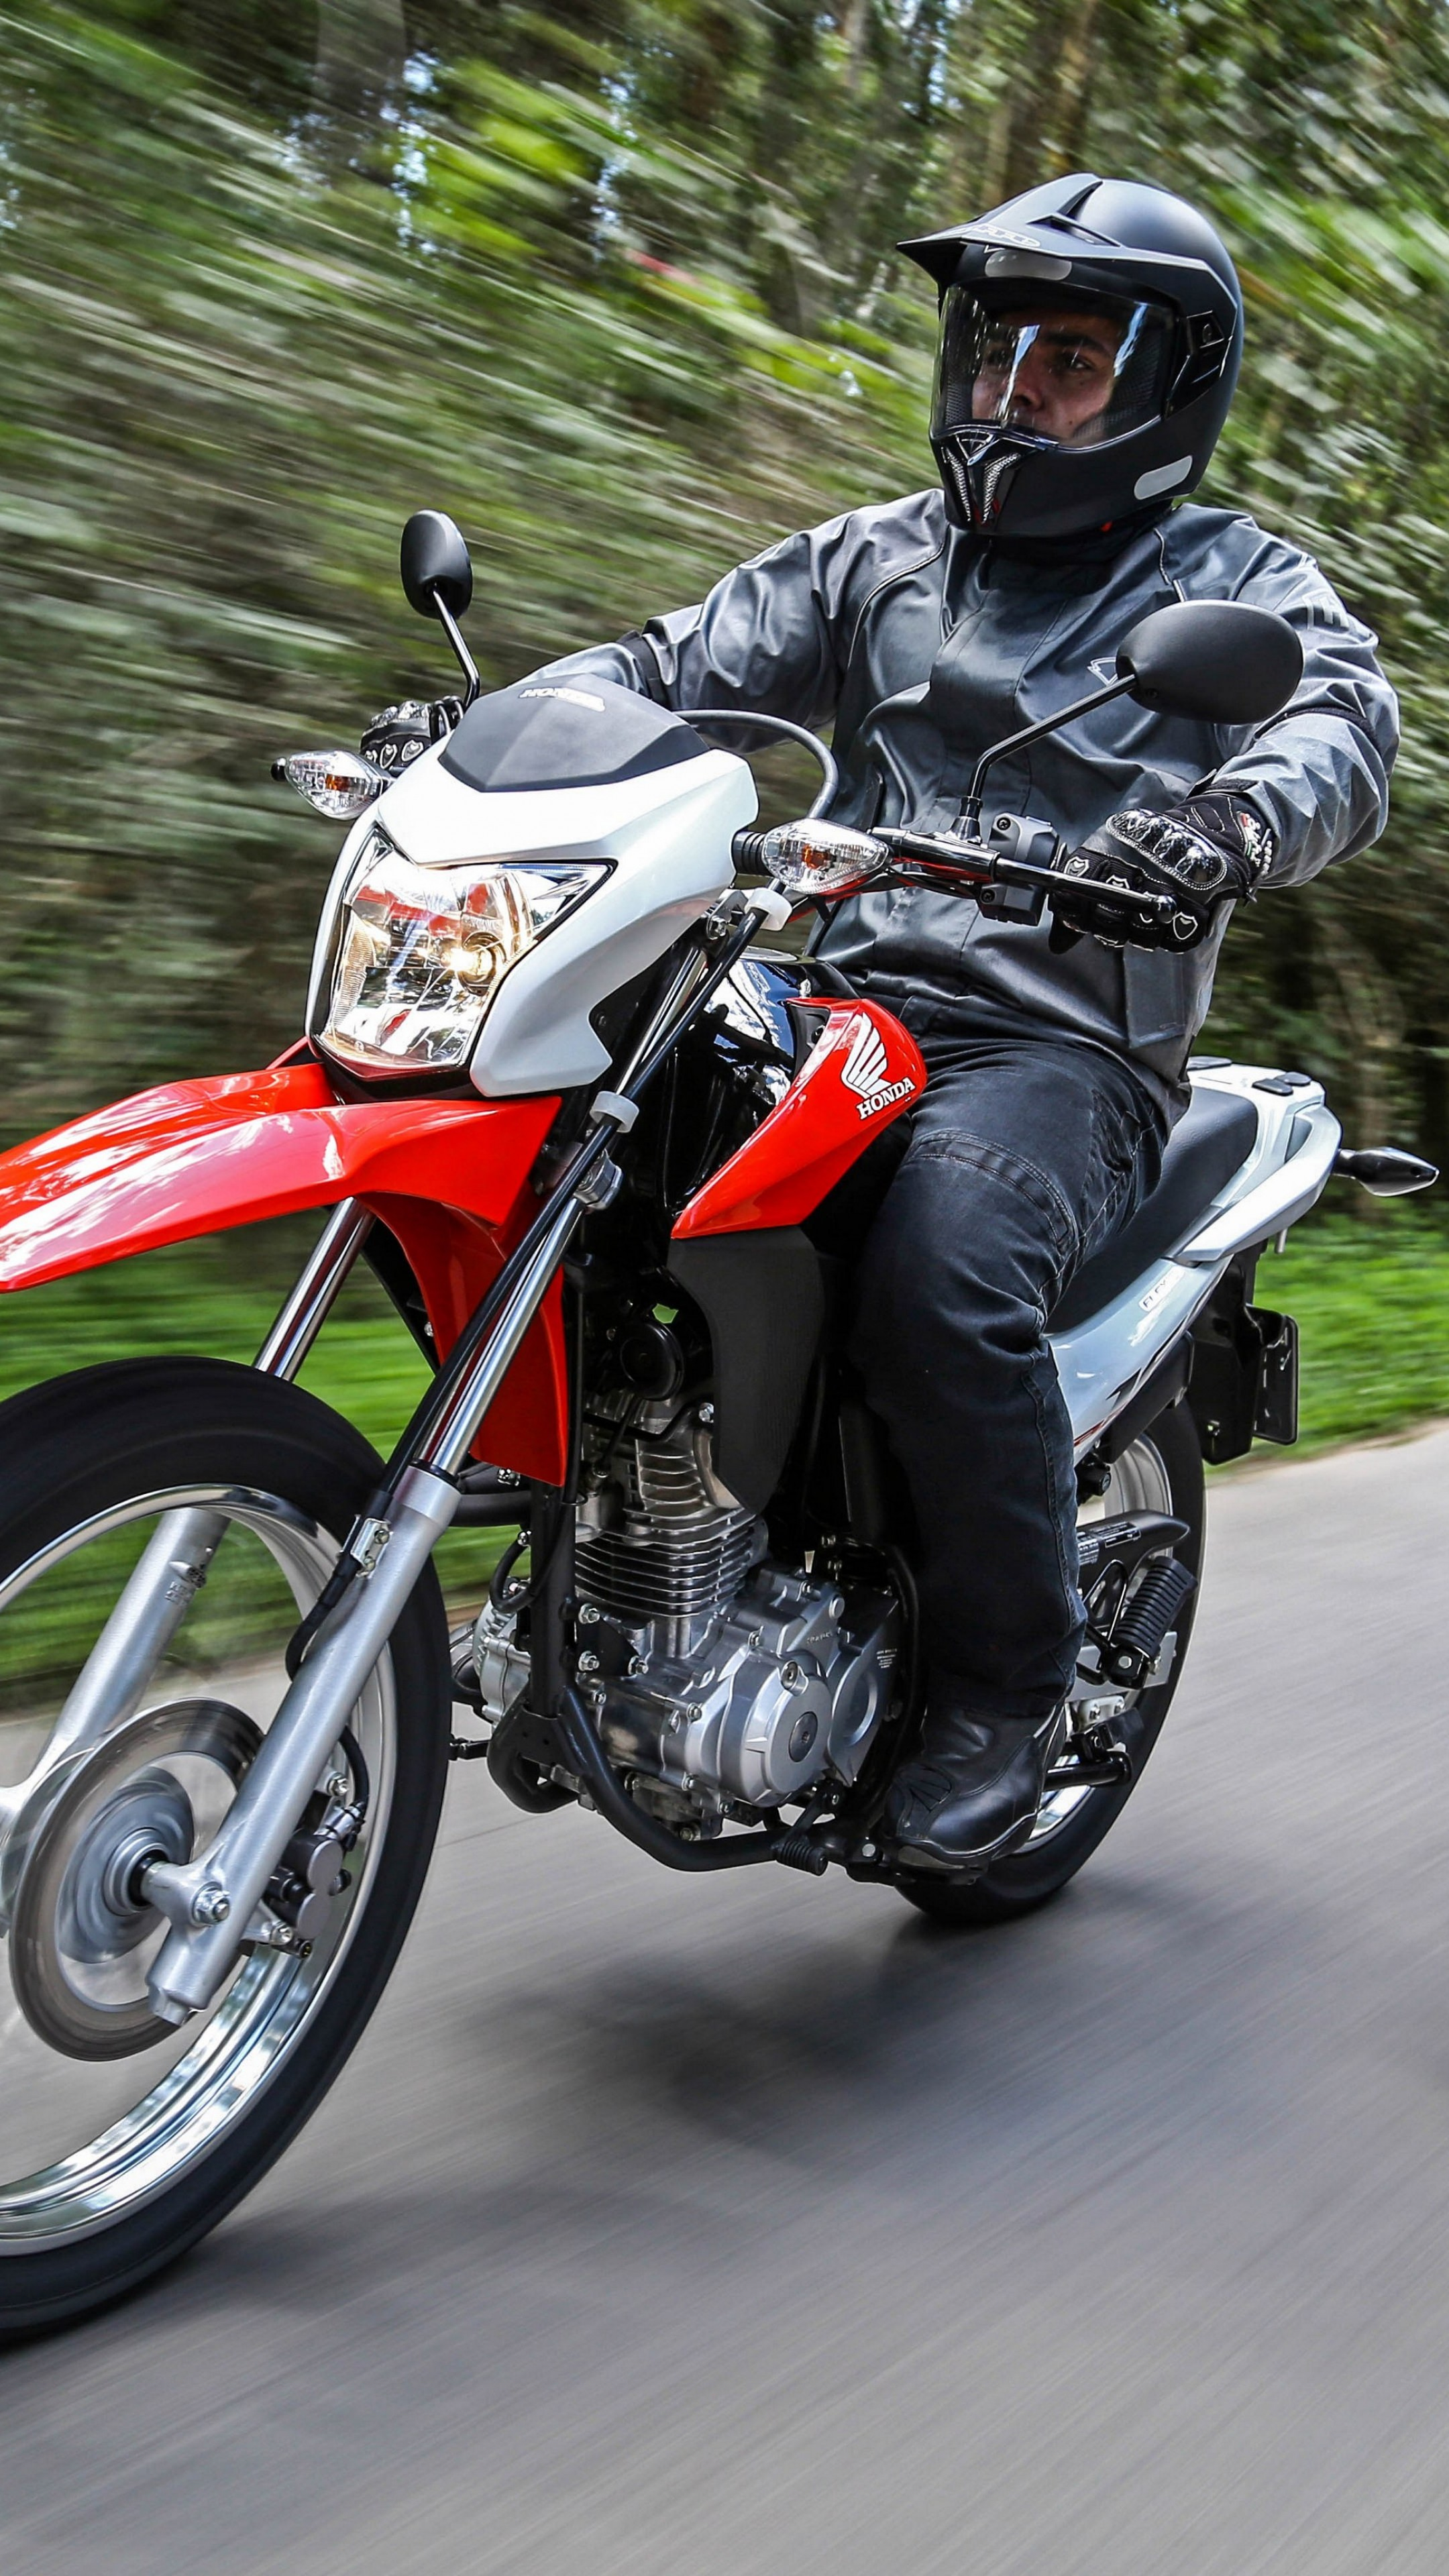 Wallpaper Honda Bros 160 MXR 160 Best Bikes 2015 motorcycle 2160x3840